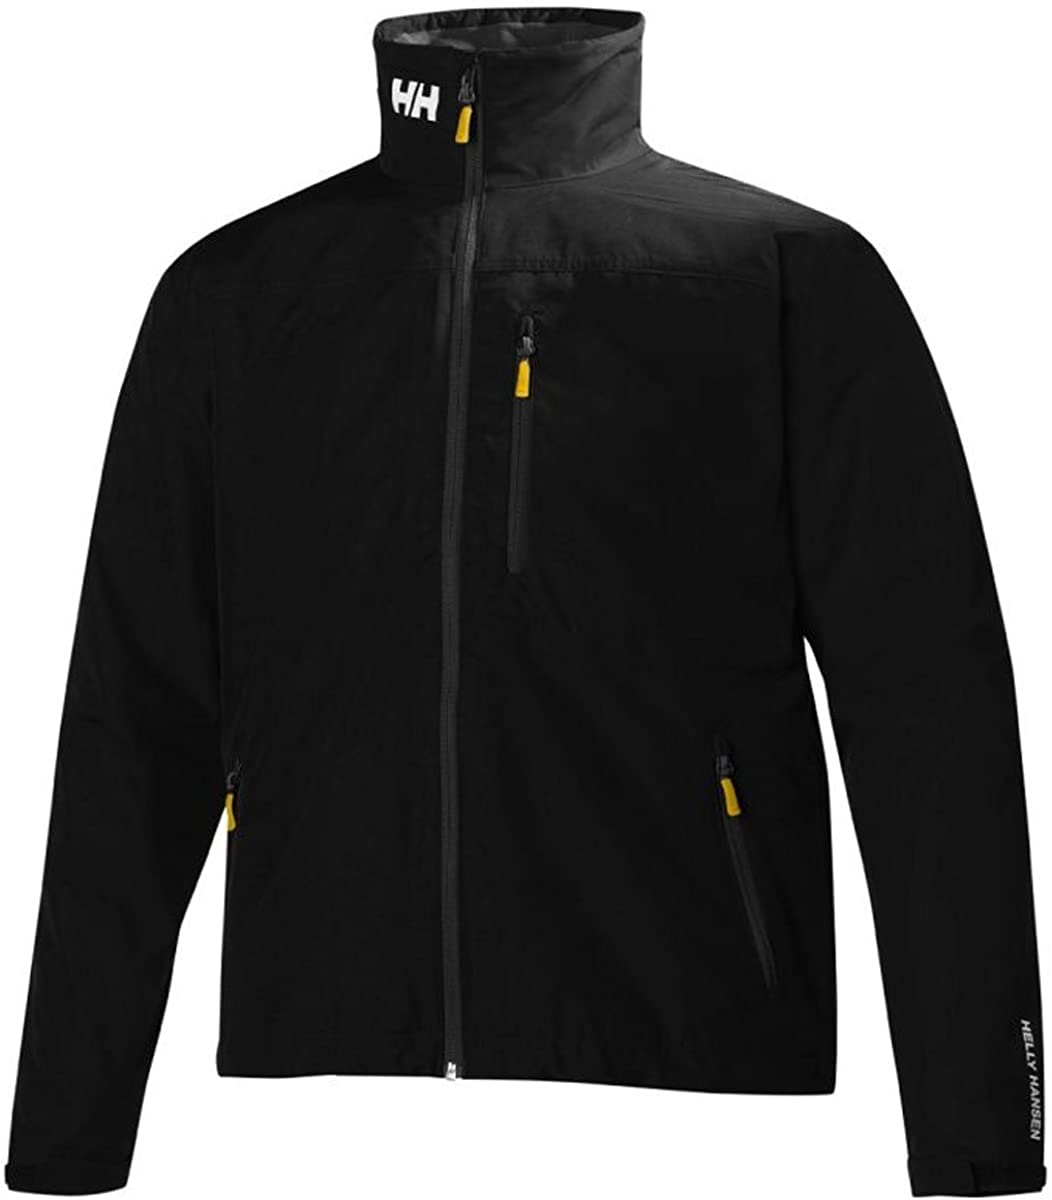 Helly-Hansen Men's Crew Jacket: Clothing